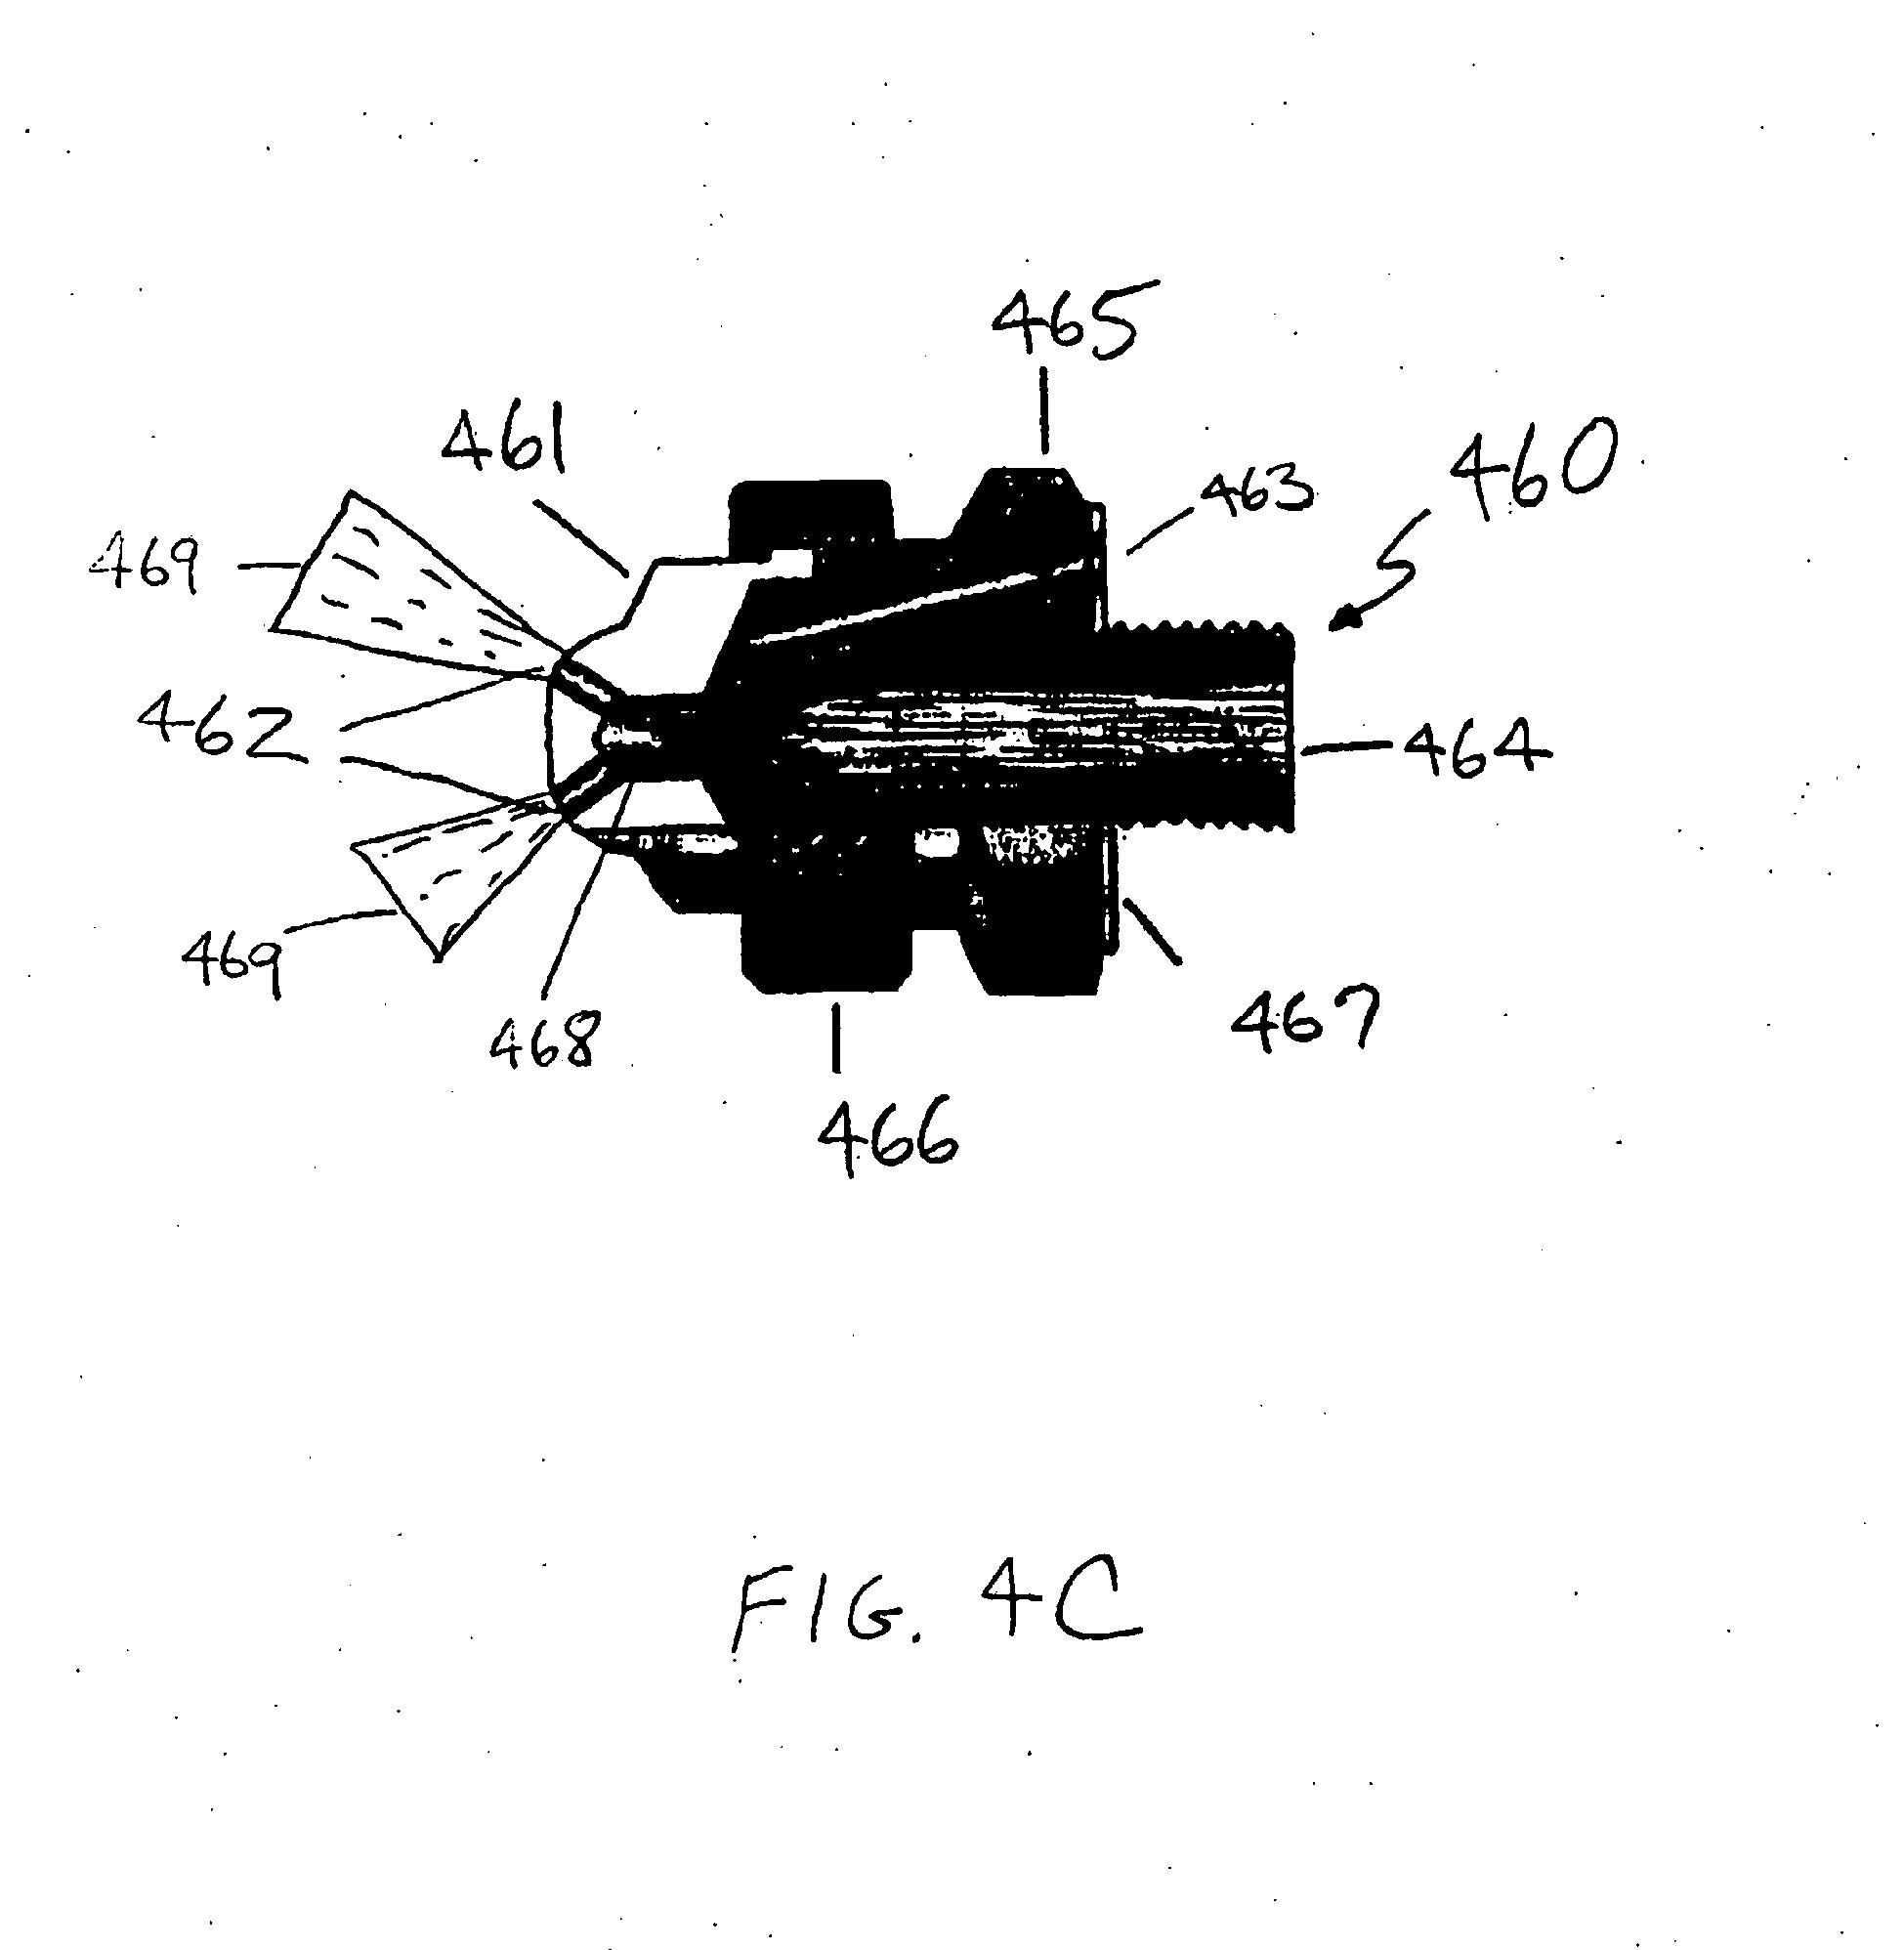 Piano Avec Four Gaz method for producing dry particles - patent 1485069